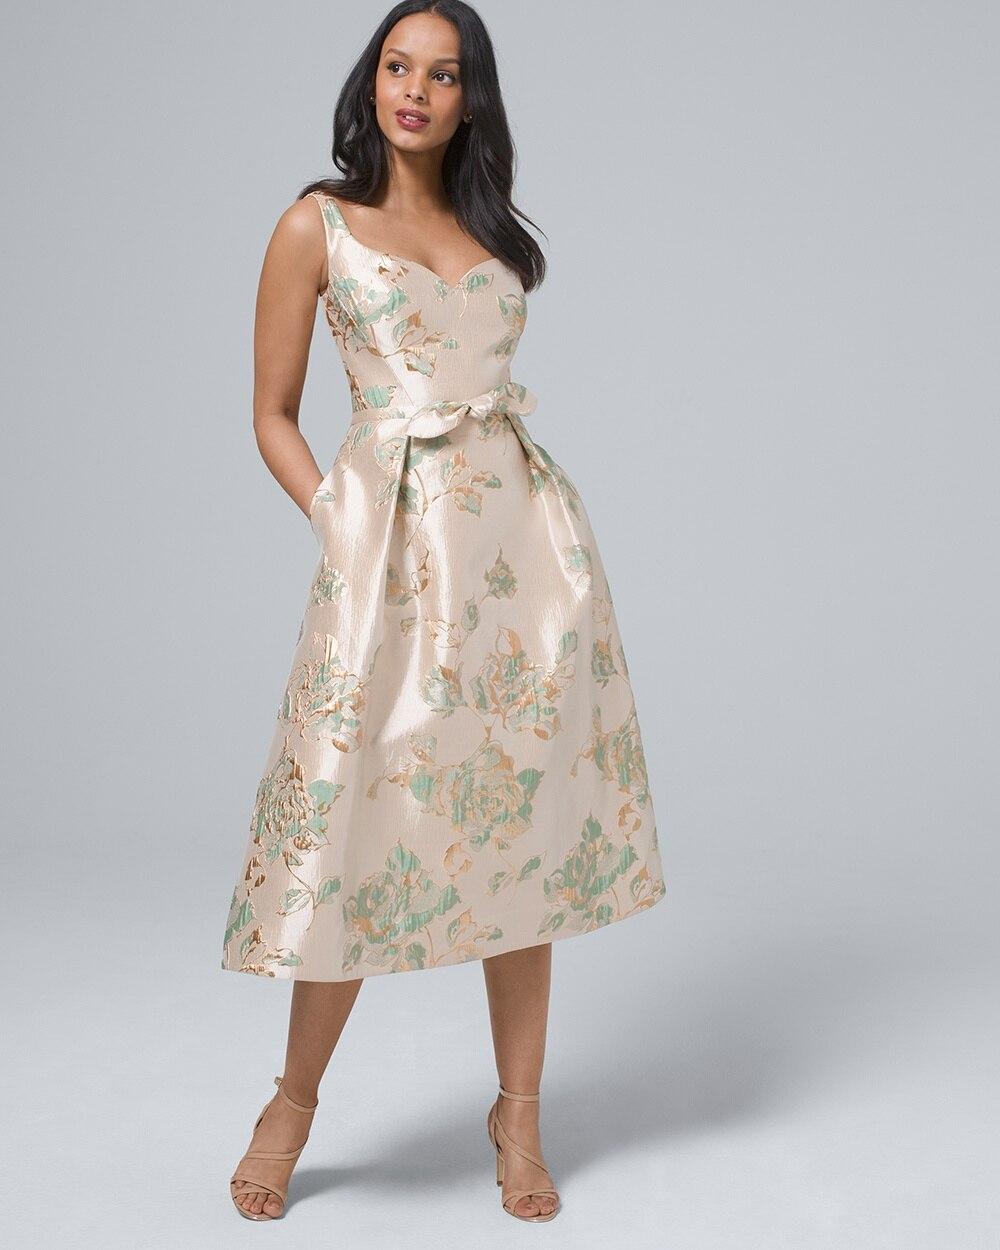 bc099c67a Floral Jacquard Fit-and-Flare Midi Dress - White House Black Market